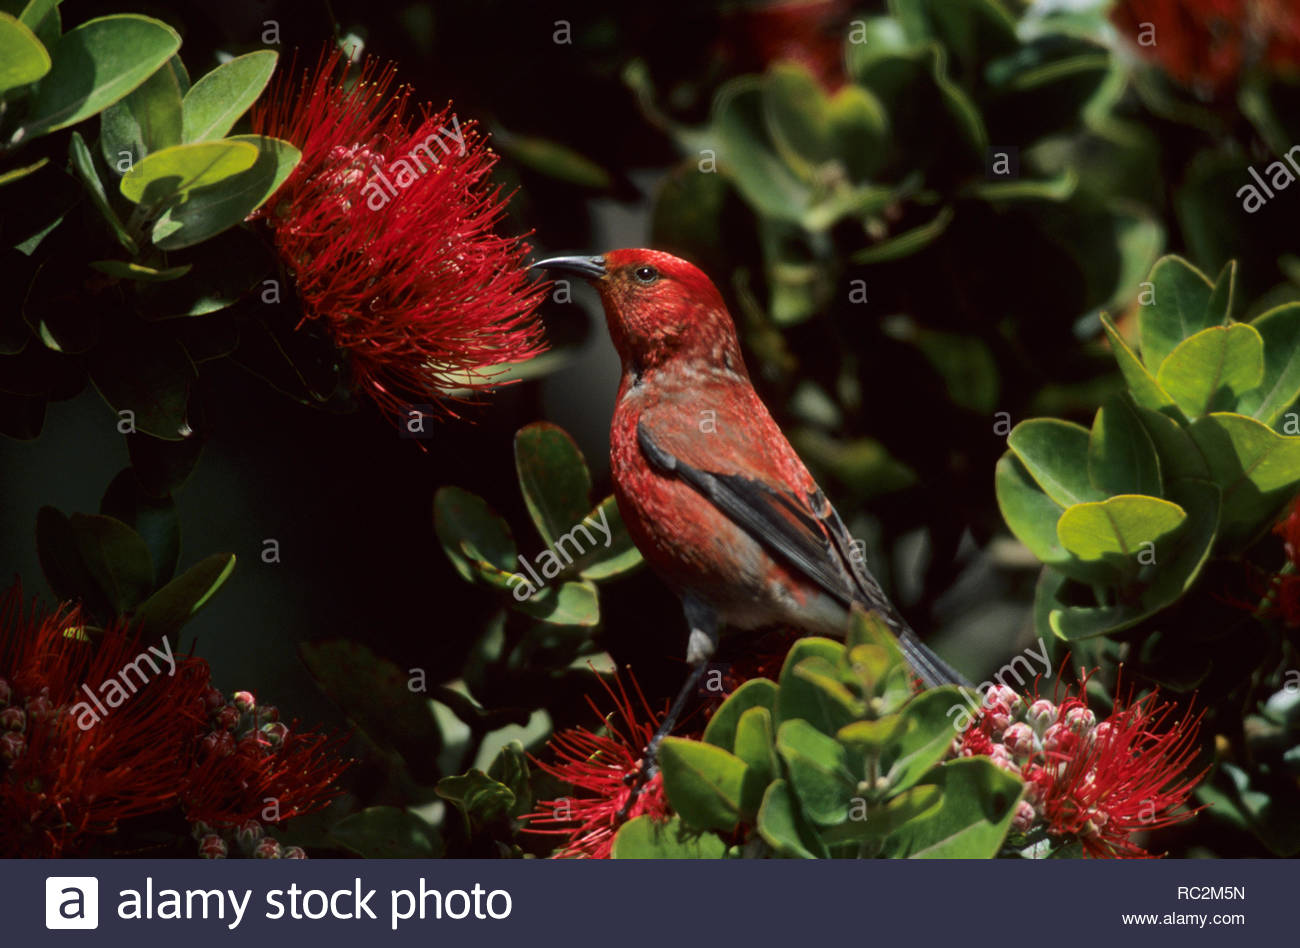 Apapane - auf Ohio Blume Himatione sanguinea Big Island, Hawaii BI 005647 Stockbild